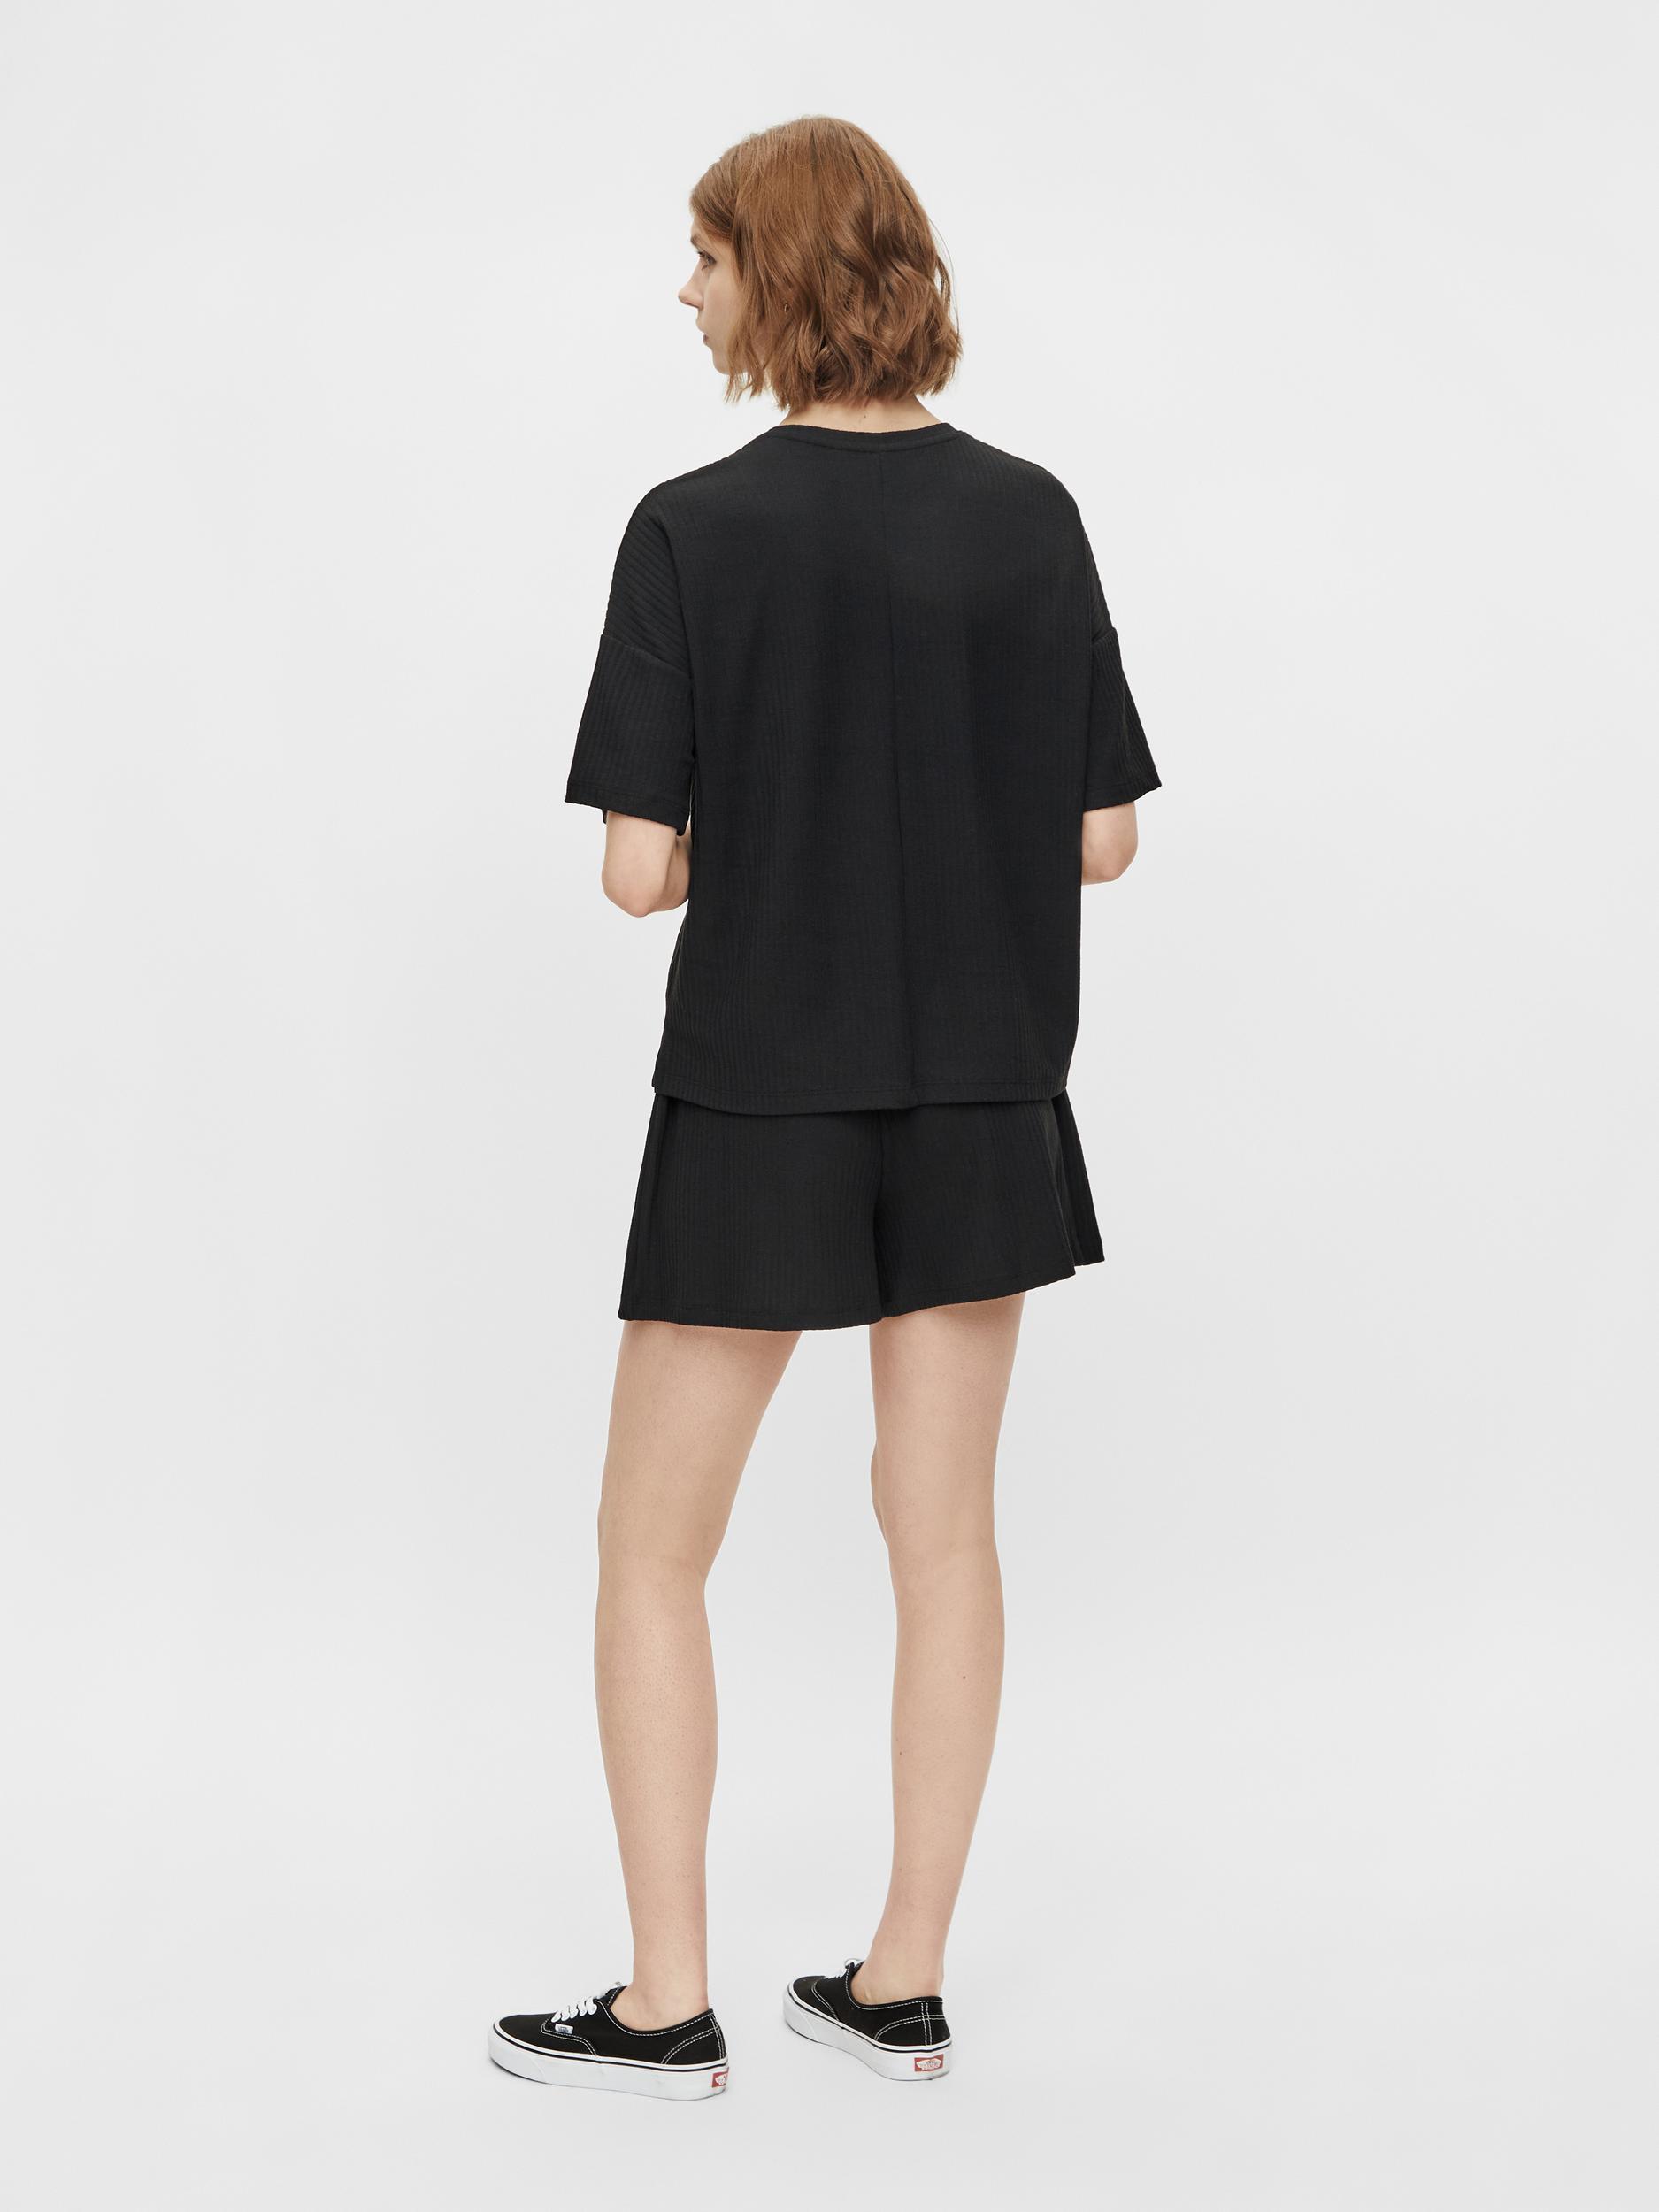 Pieces Ribbi t-shirt, black, medium